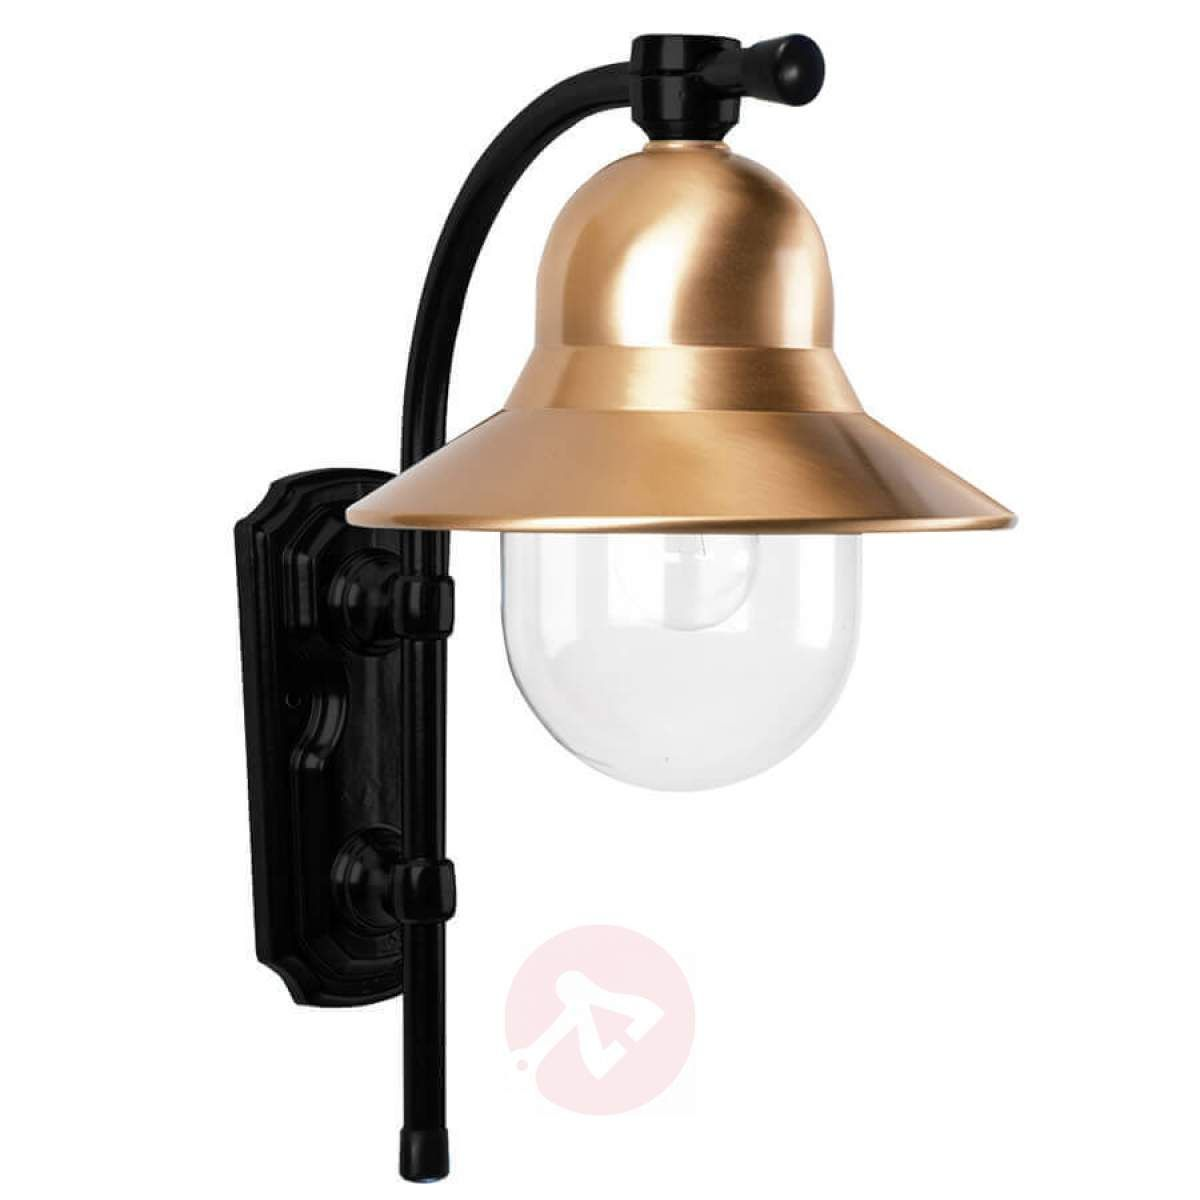 Zewnetrzna Lampa Scienna Toscane Czarna Wall Lights Lamp Sconces